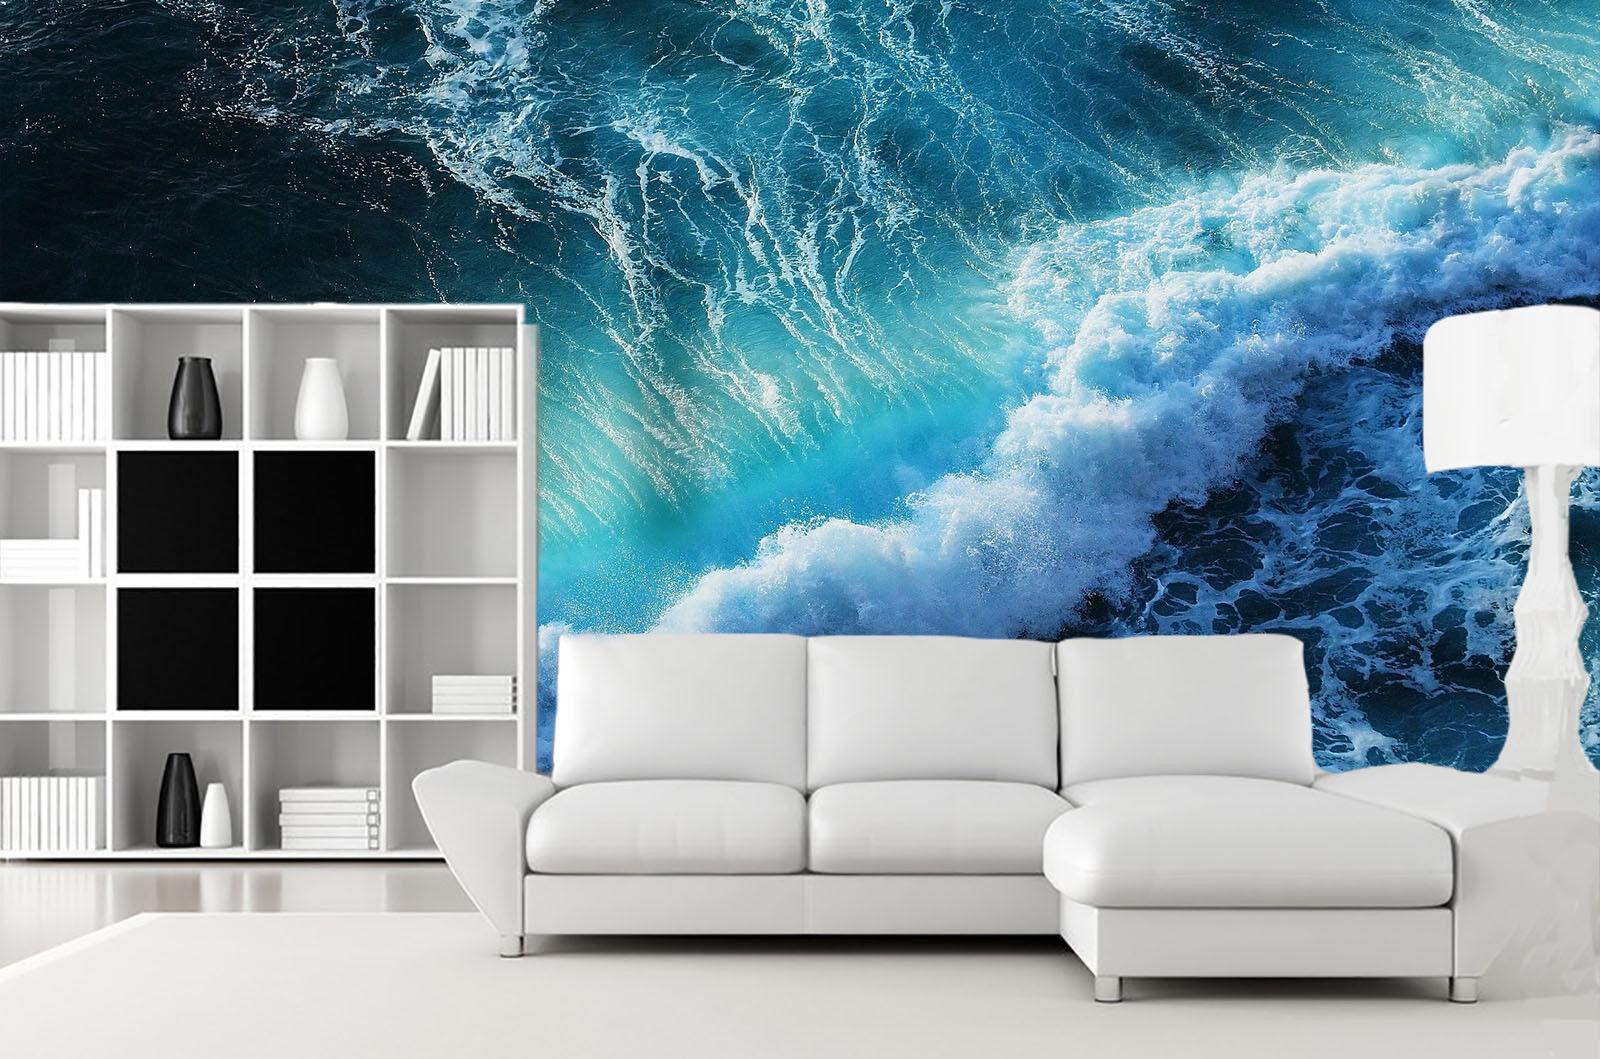 3D Sturmwellen 963 Well Tapete Wandgemälde Tapete Tapeten Bild Familie DE Summer  | Erste Qualität  | Günstigstes  | Langfristiger Ruf